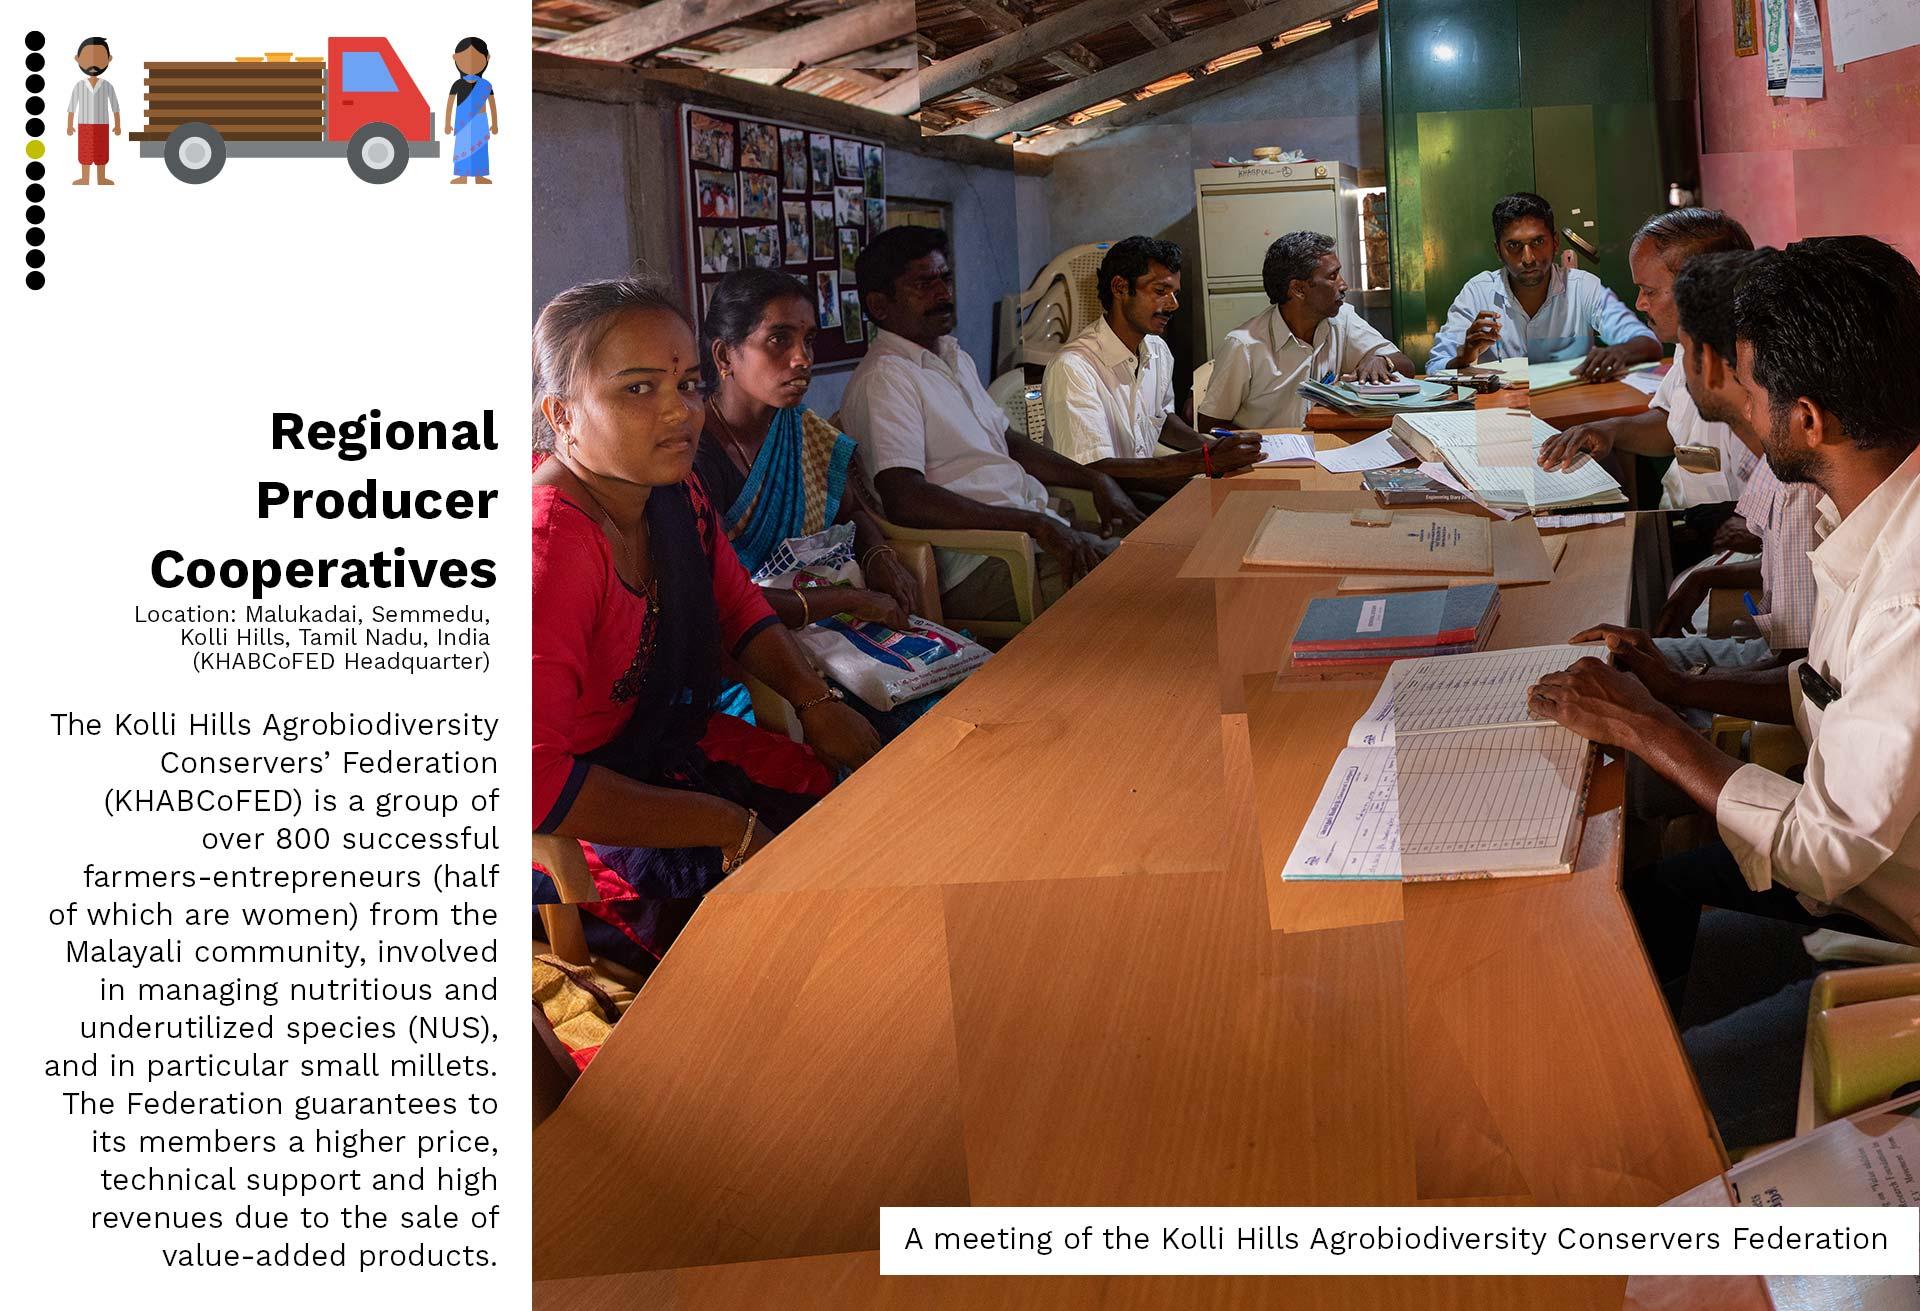 06-Regional Producer Cooperatives